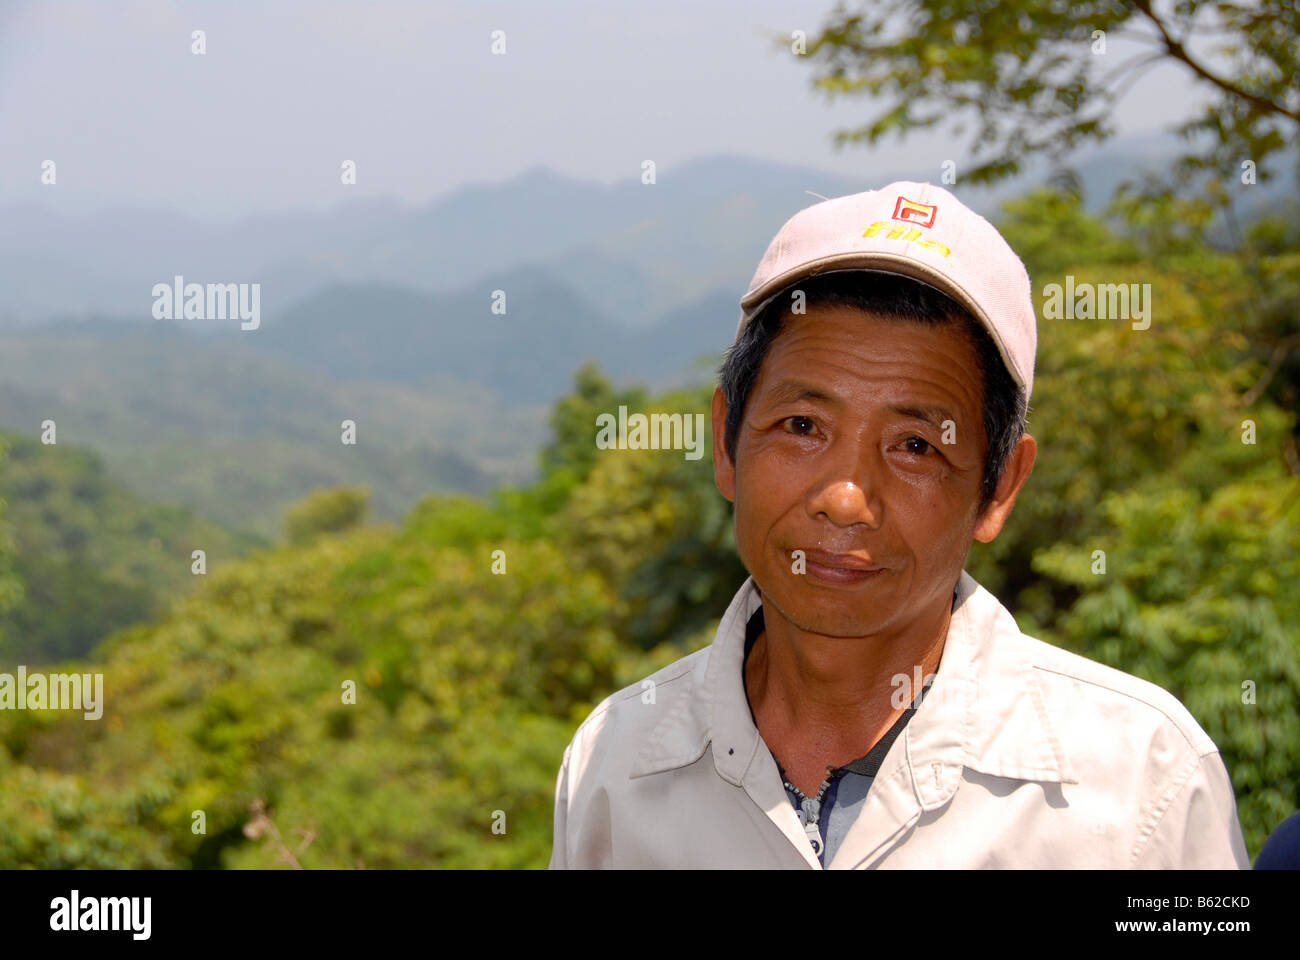 Laotian man, portrait, in natural mountain landscape, Phongsali Province, Laos, Southeast Asia - Stock Image